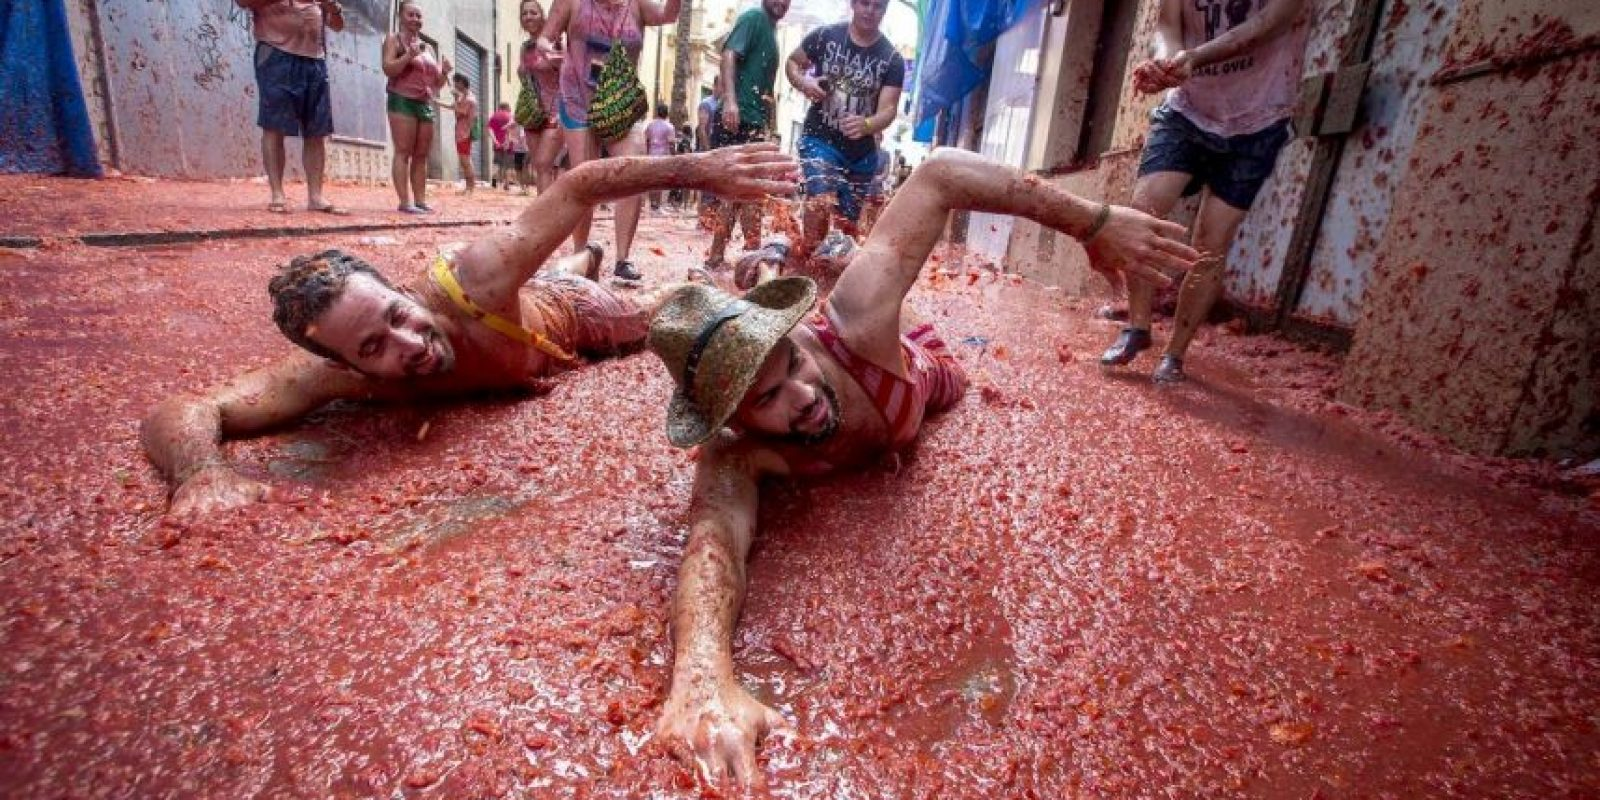 Festival de la Tomatina, celebrado en Buñol, España. Foto:AFP